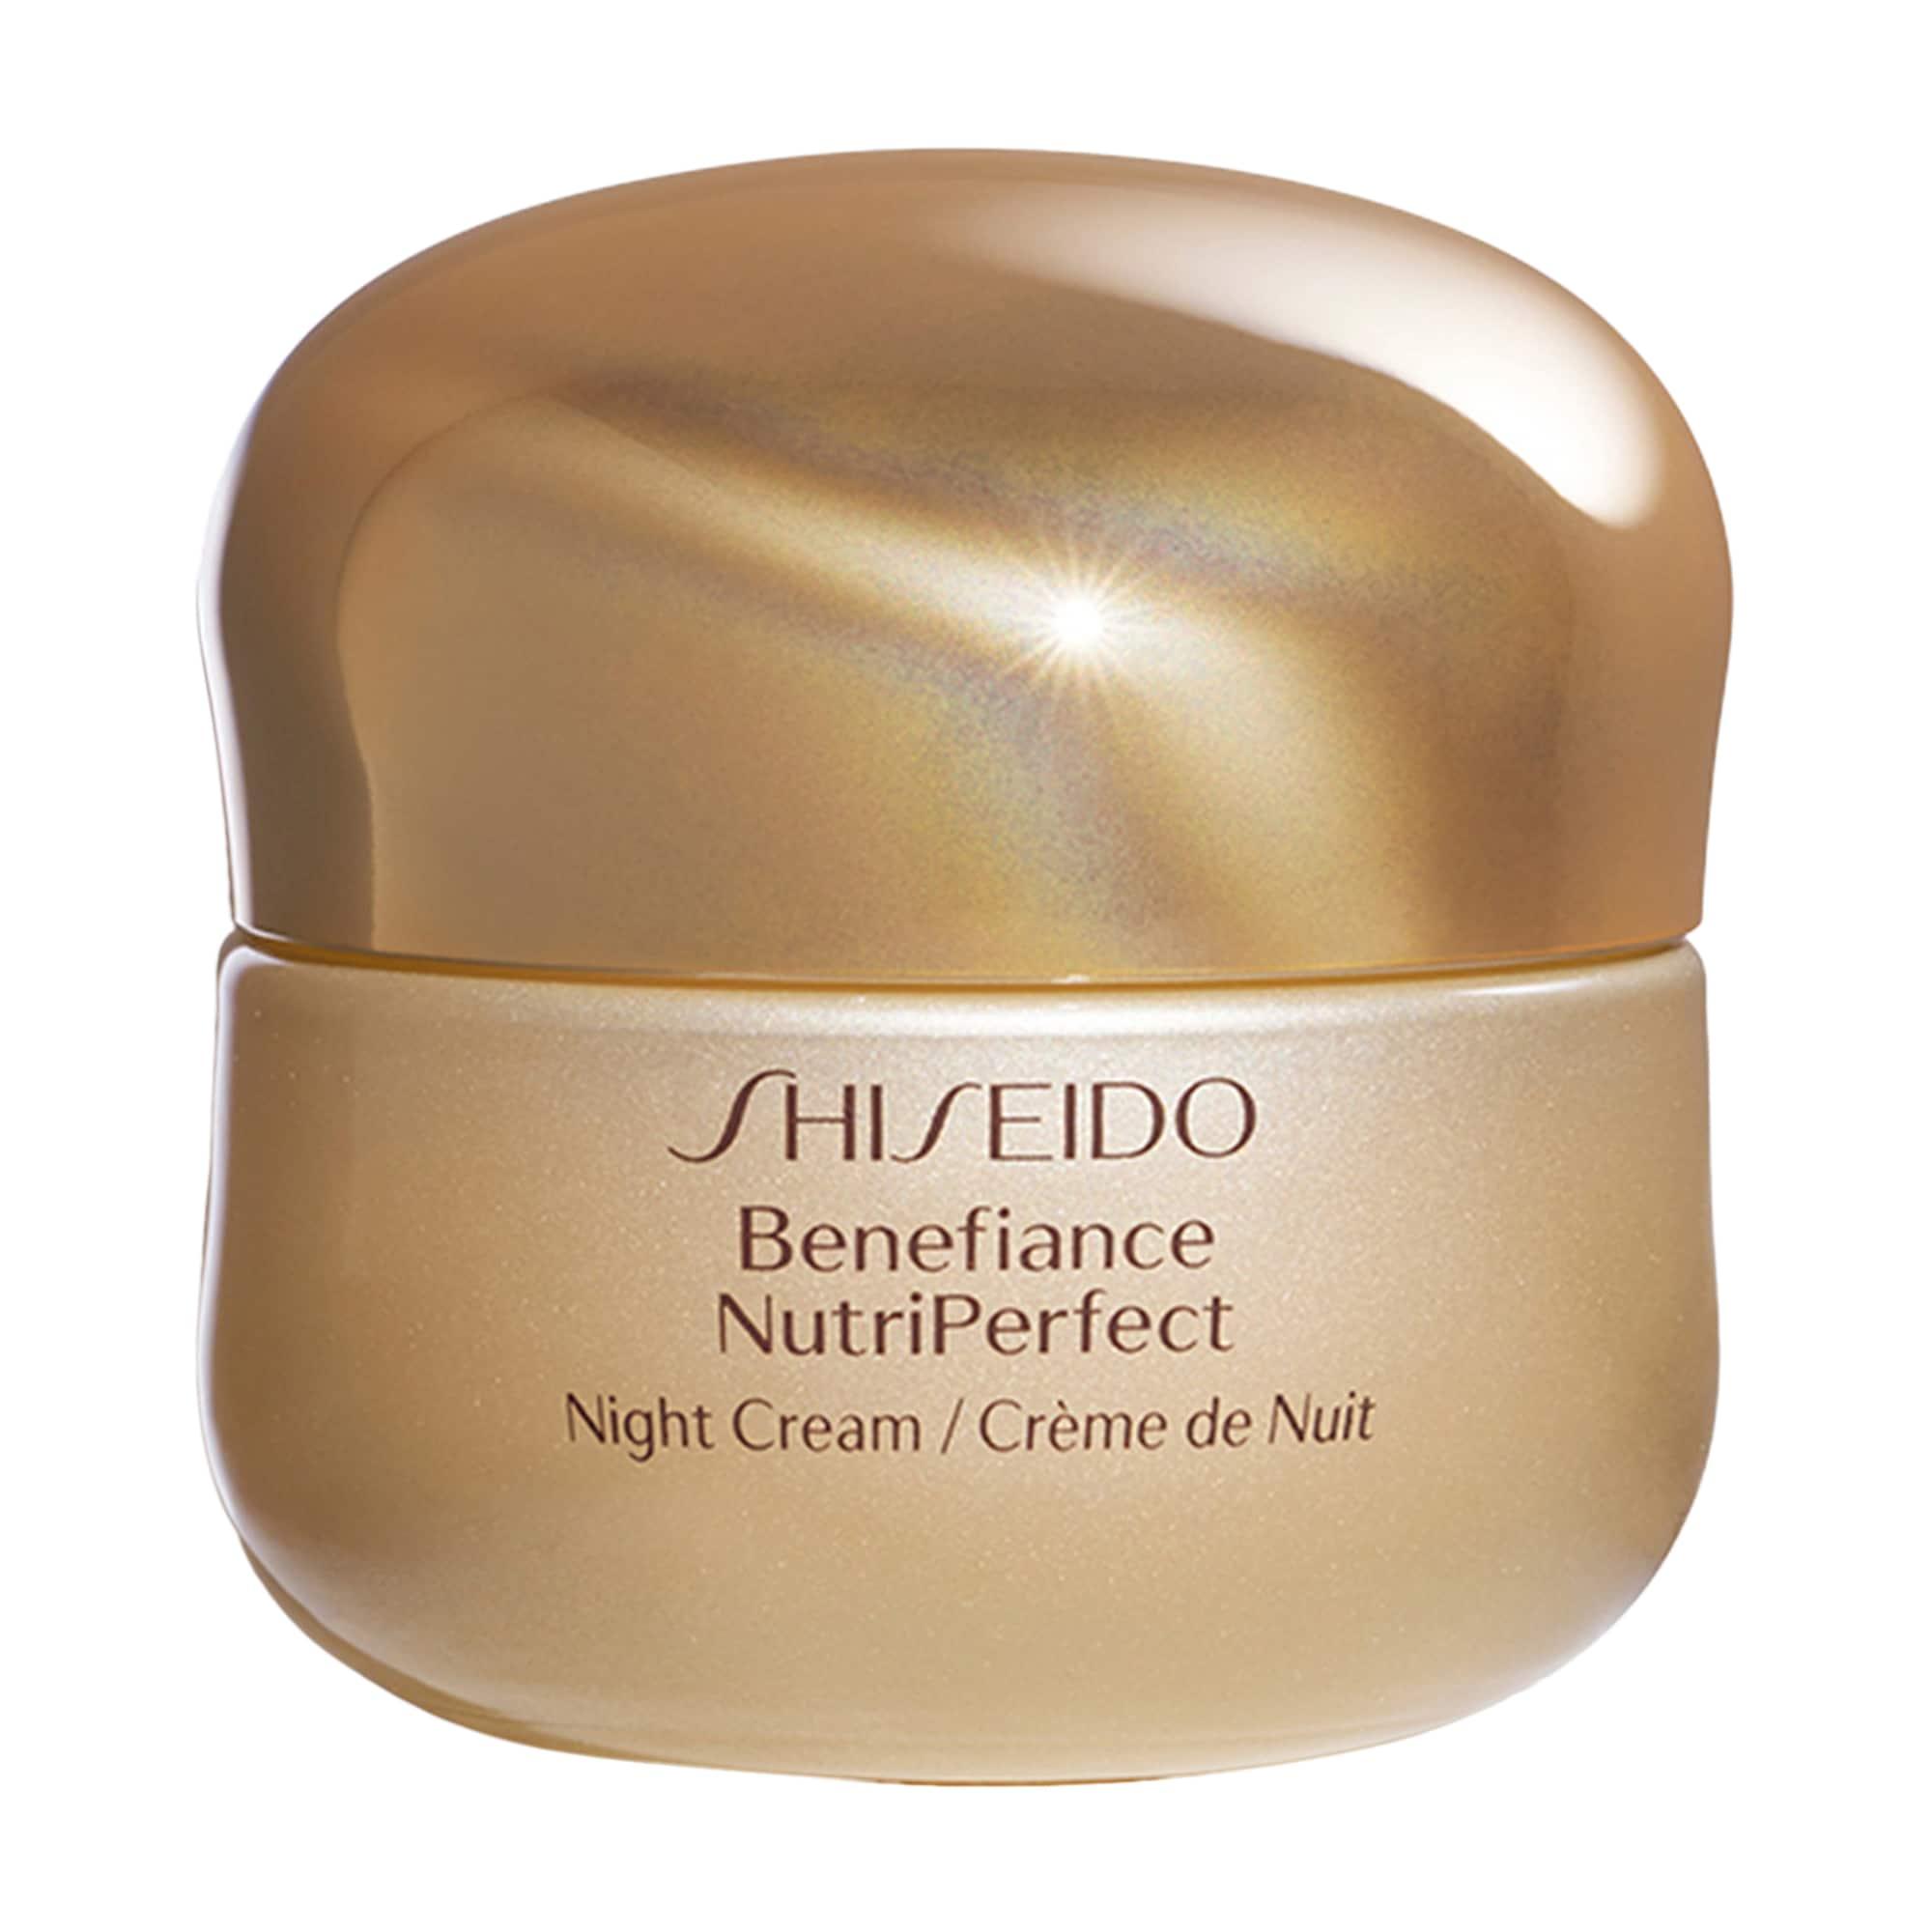 Shiseido - Benefiance NutriPerfect Night Cream